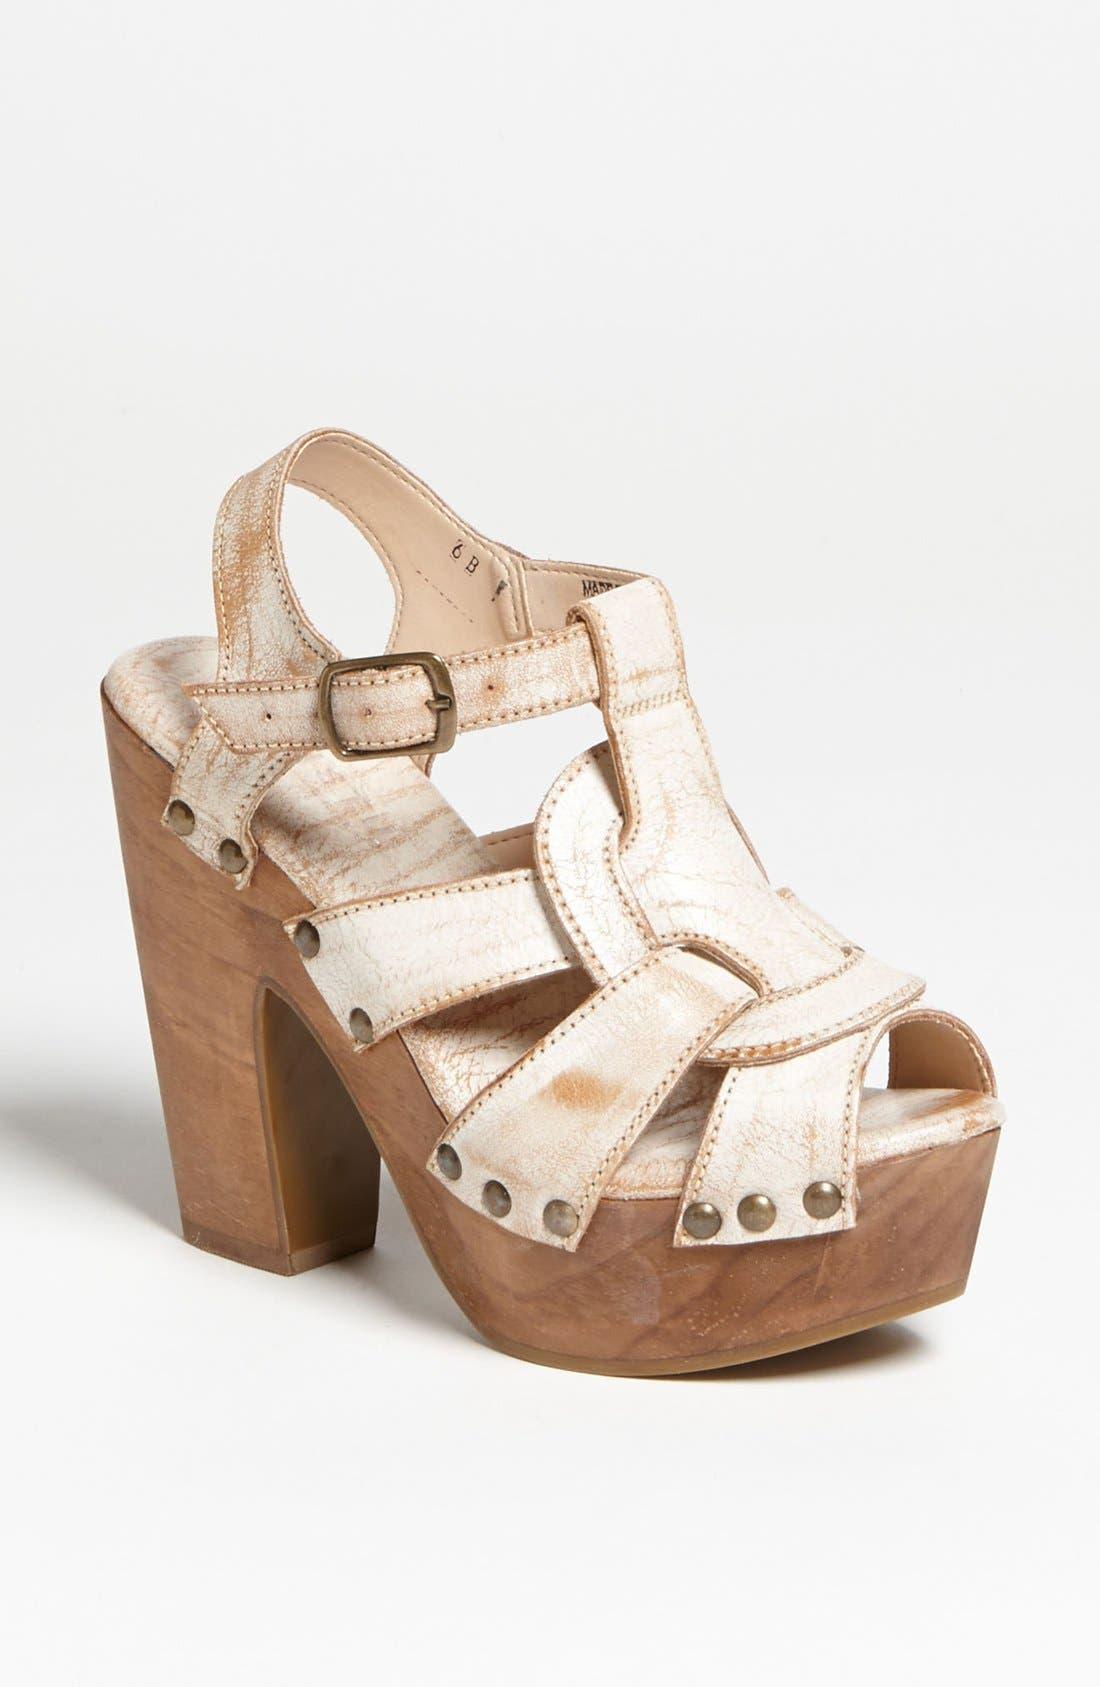 Alternate Image 1 Selected - Bed Stu 'Melissa' Sandal